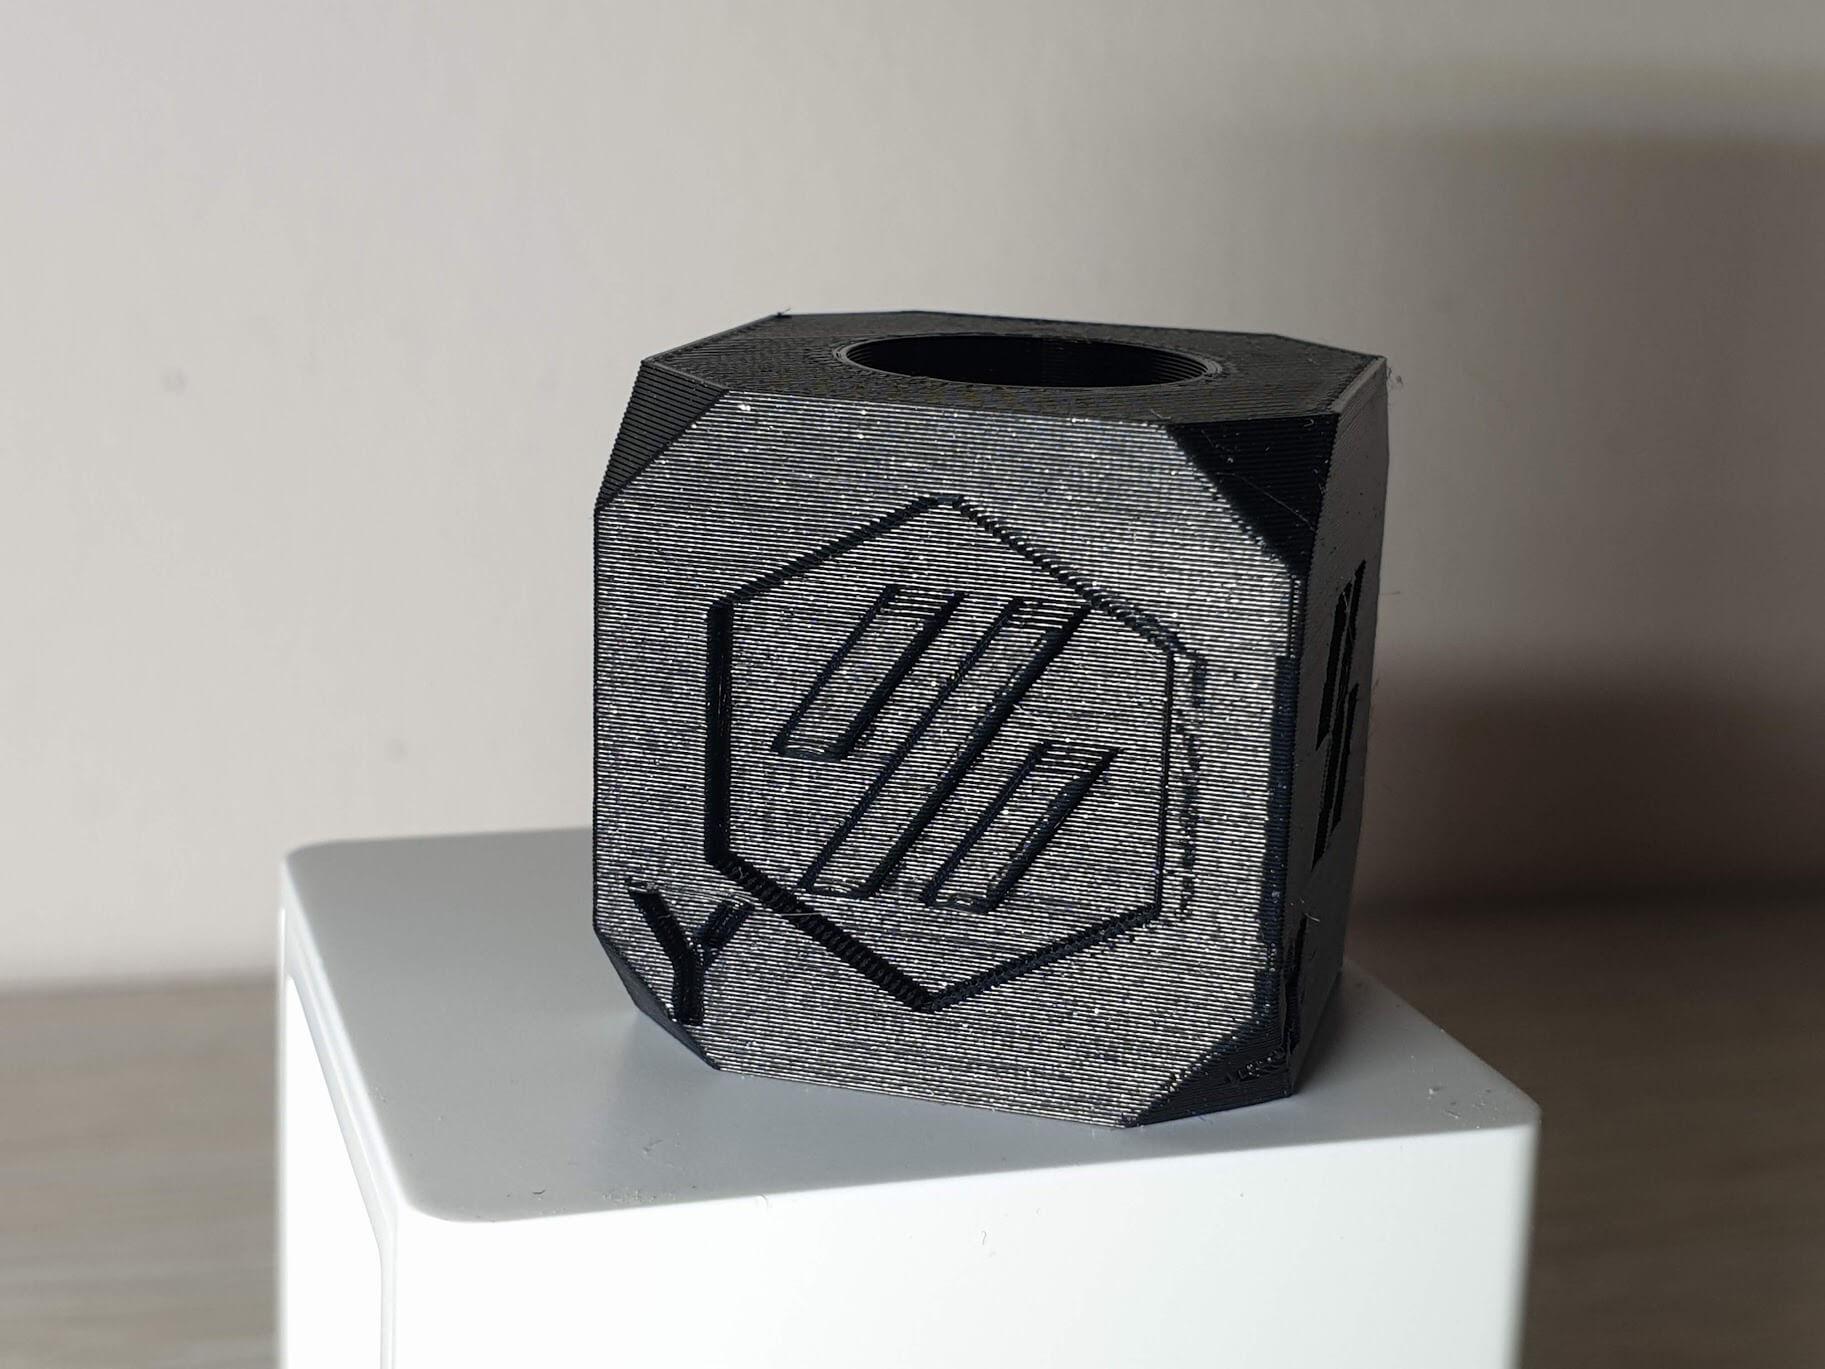 Voron Cube PETG IdeaMaker 5 | IdeaMaker Profiles for Sidewinder X1 and Genius